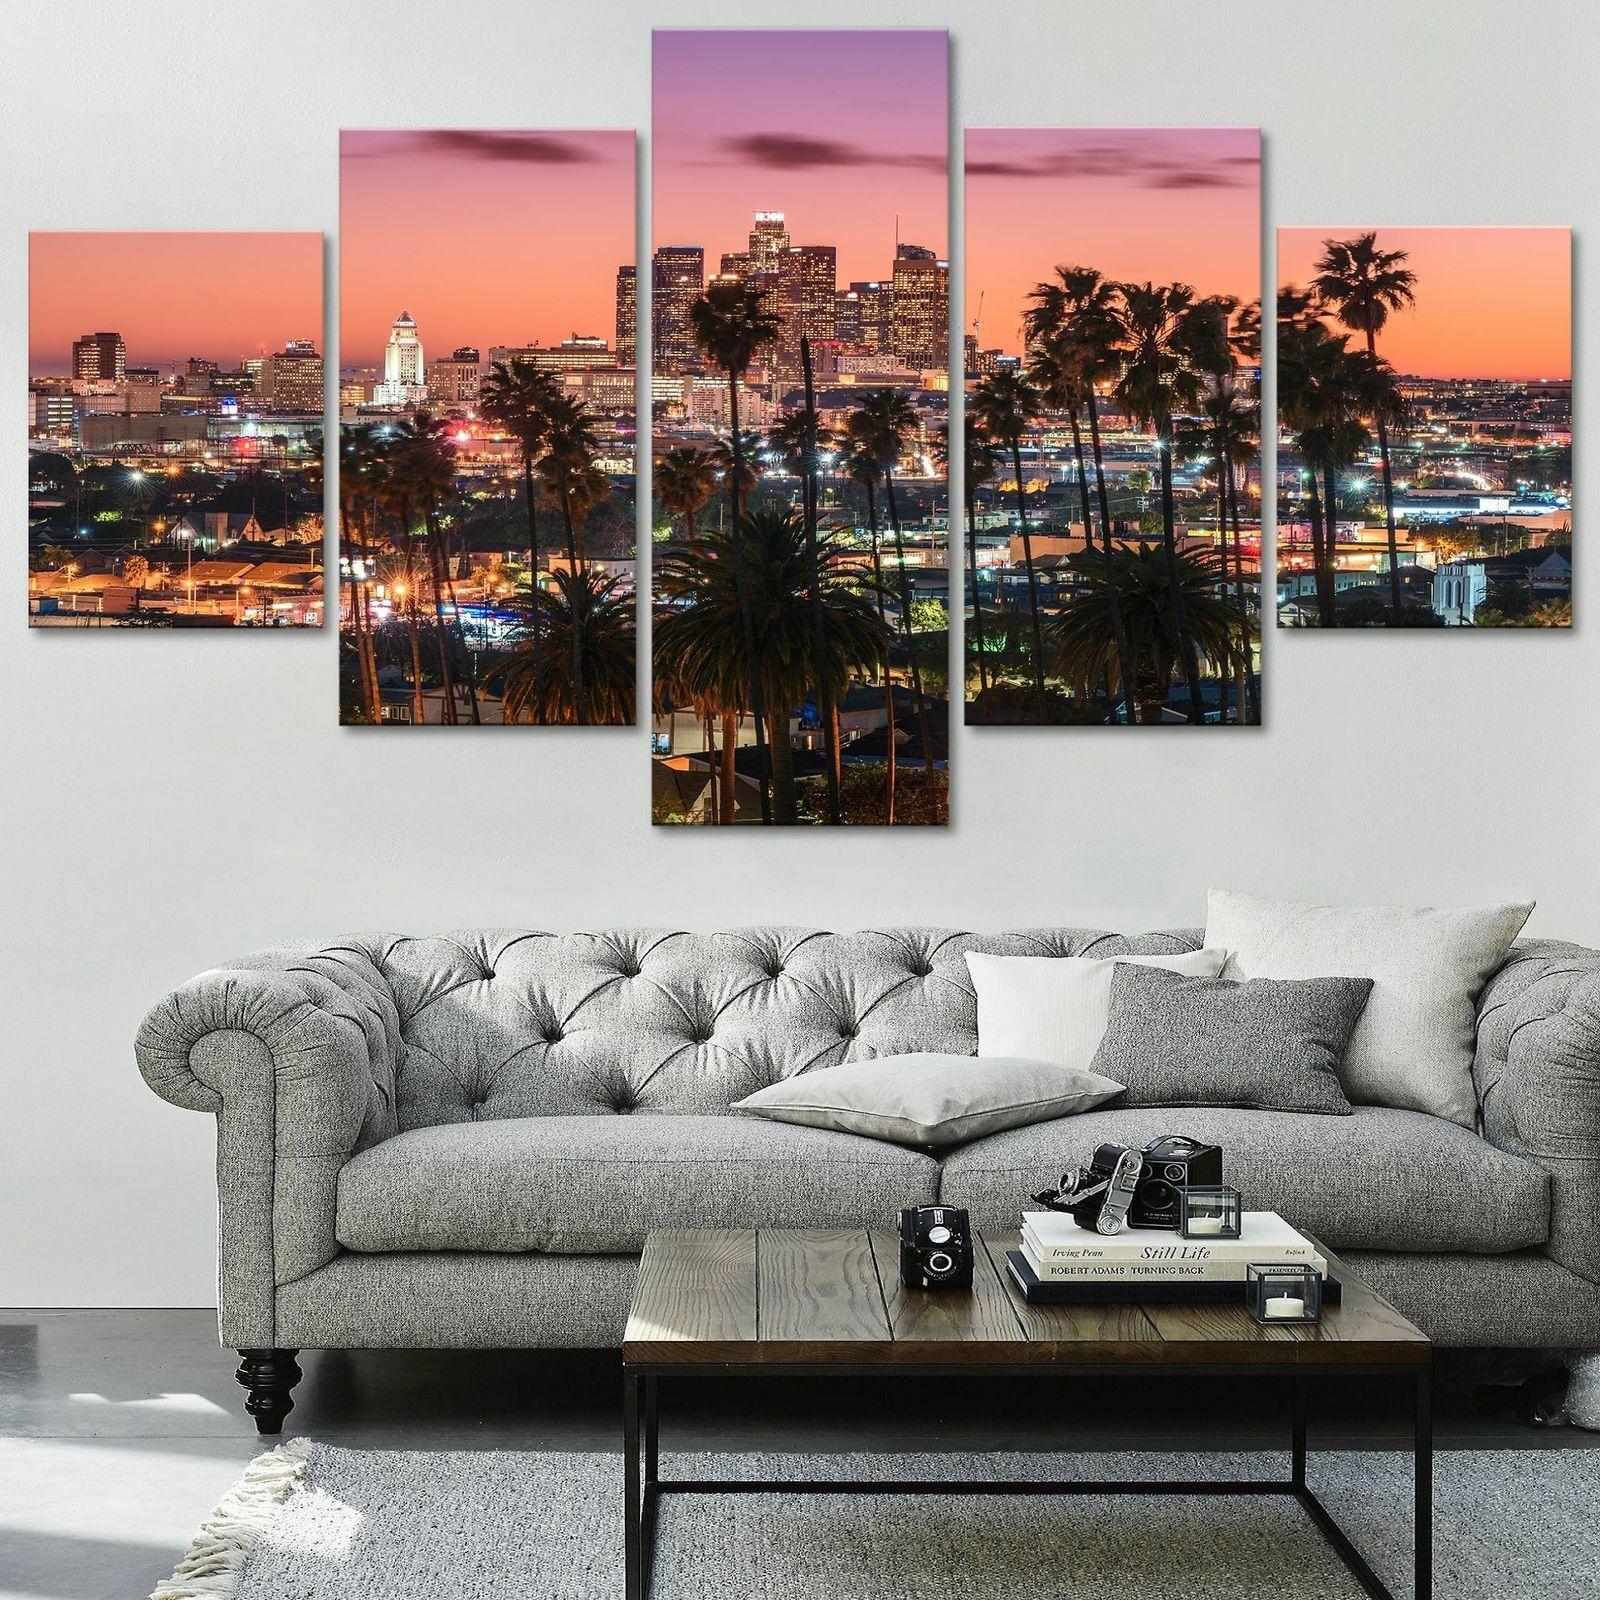 Los Angeles City Landscape 5 panel canvas Wall Art Home Decor Poster Print